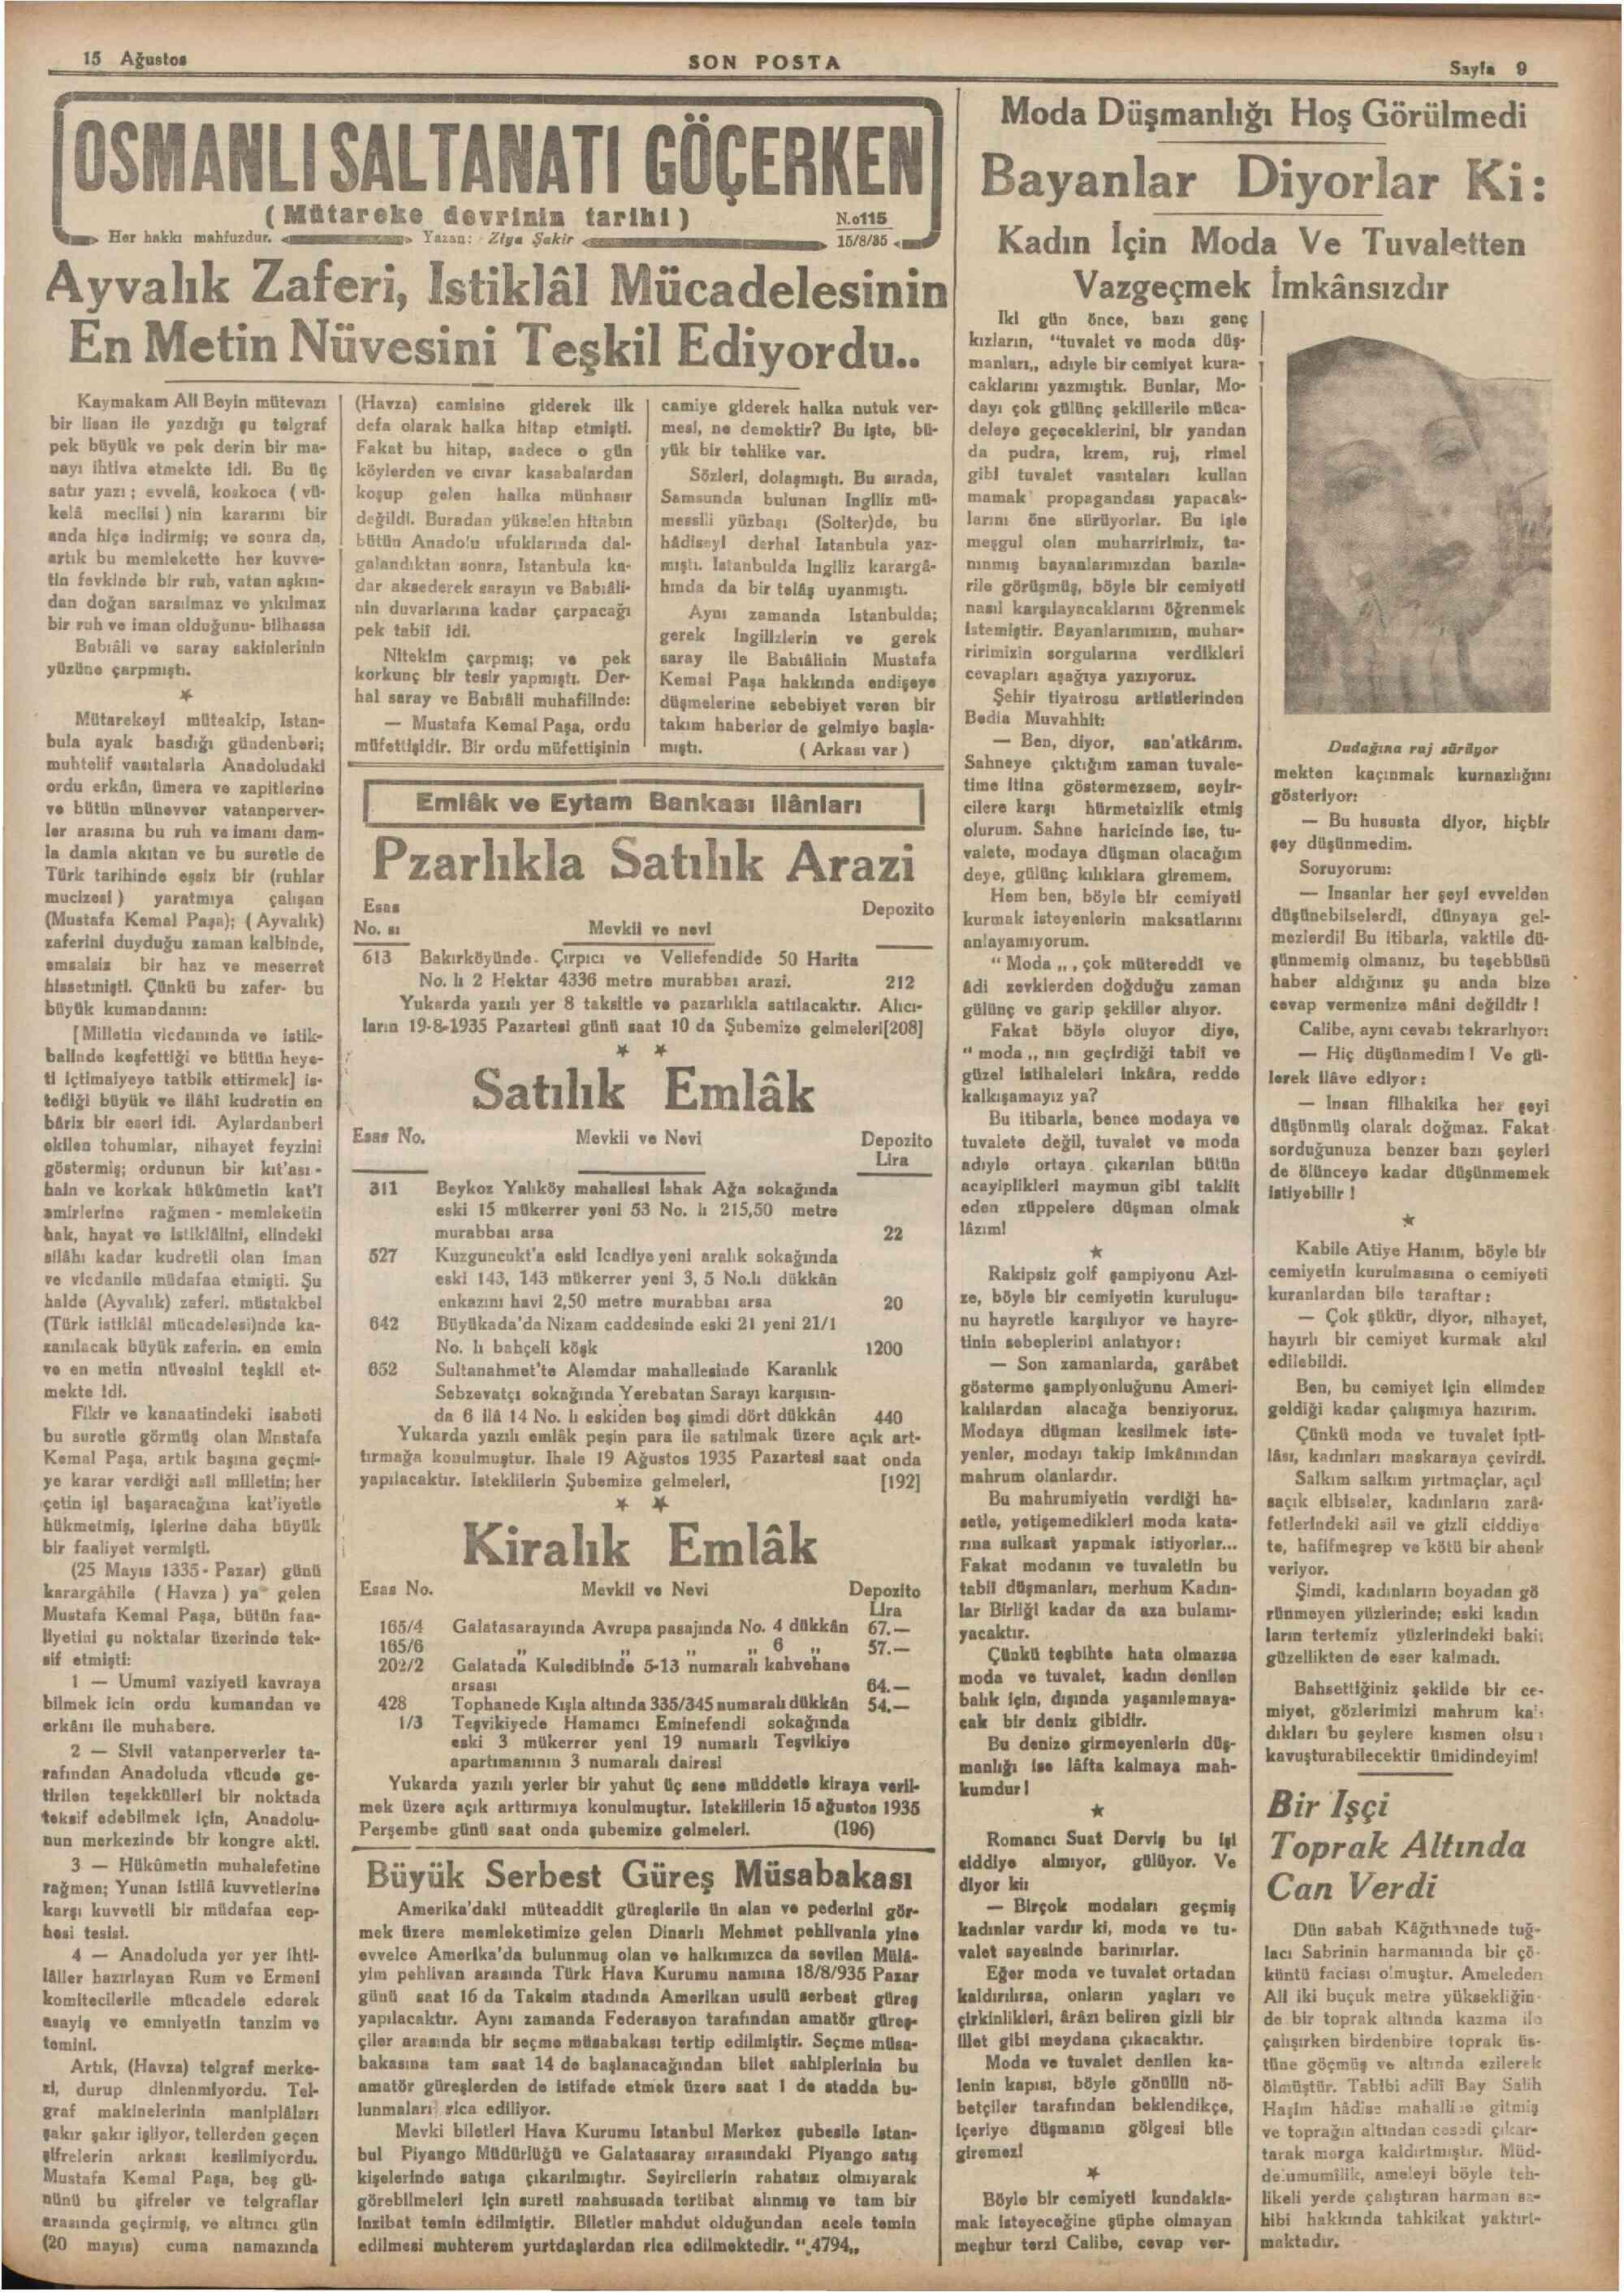 15 Ağustos 1935 Tarihli Son Posta Dergisi Sayfa 9